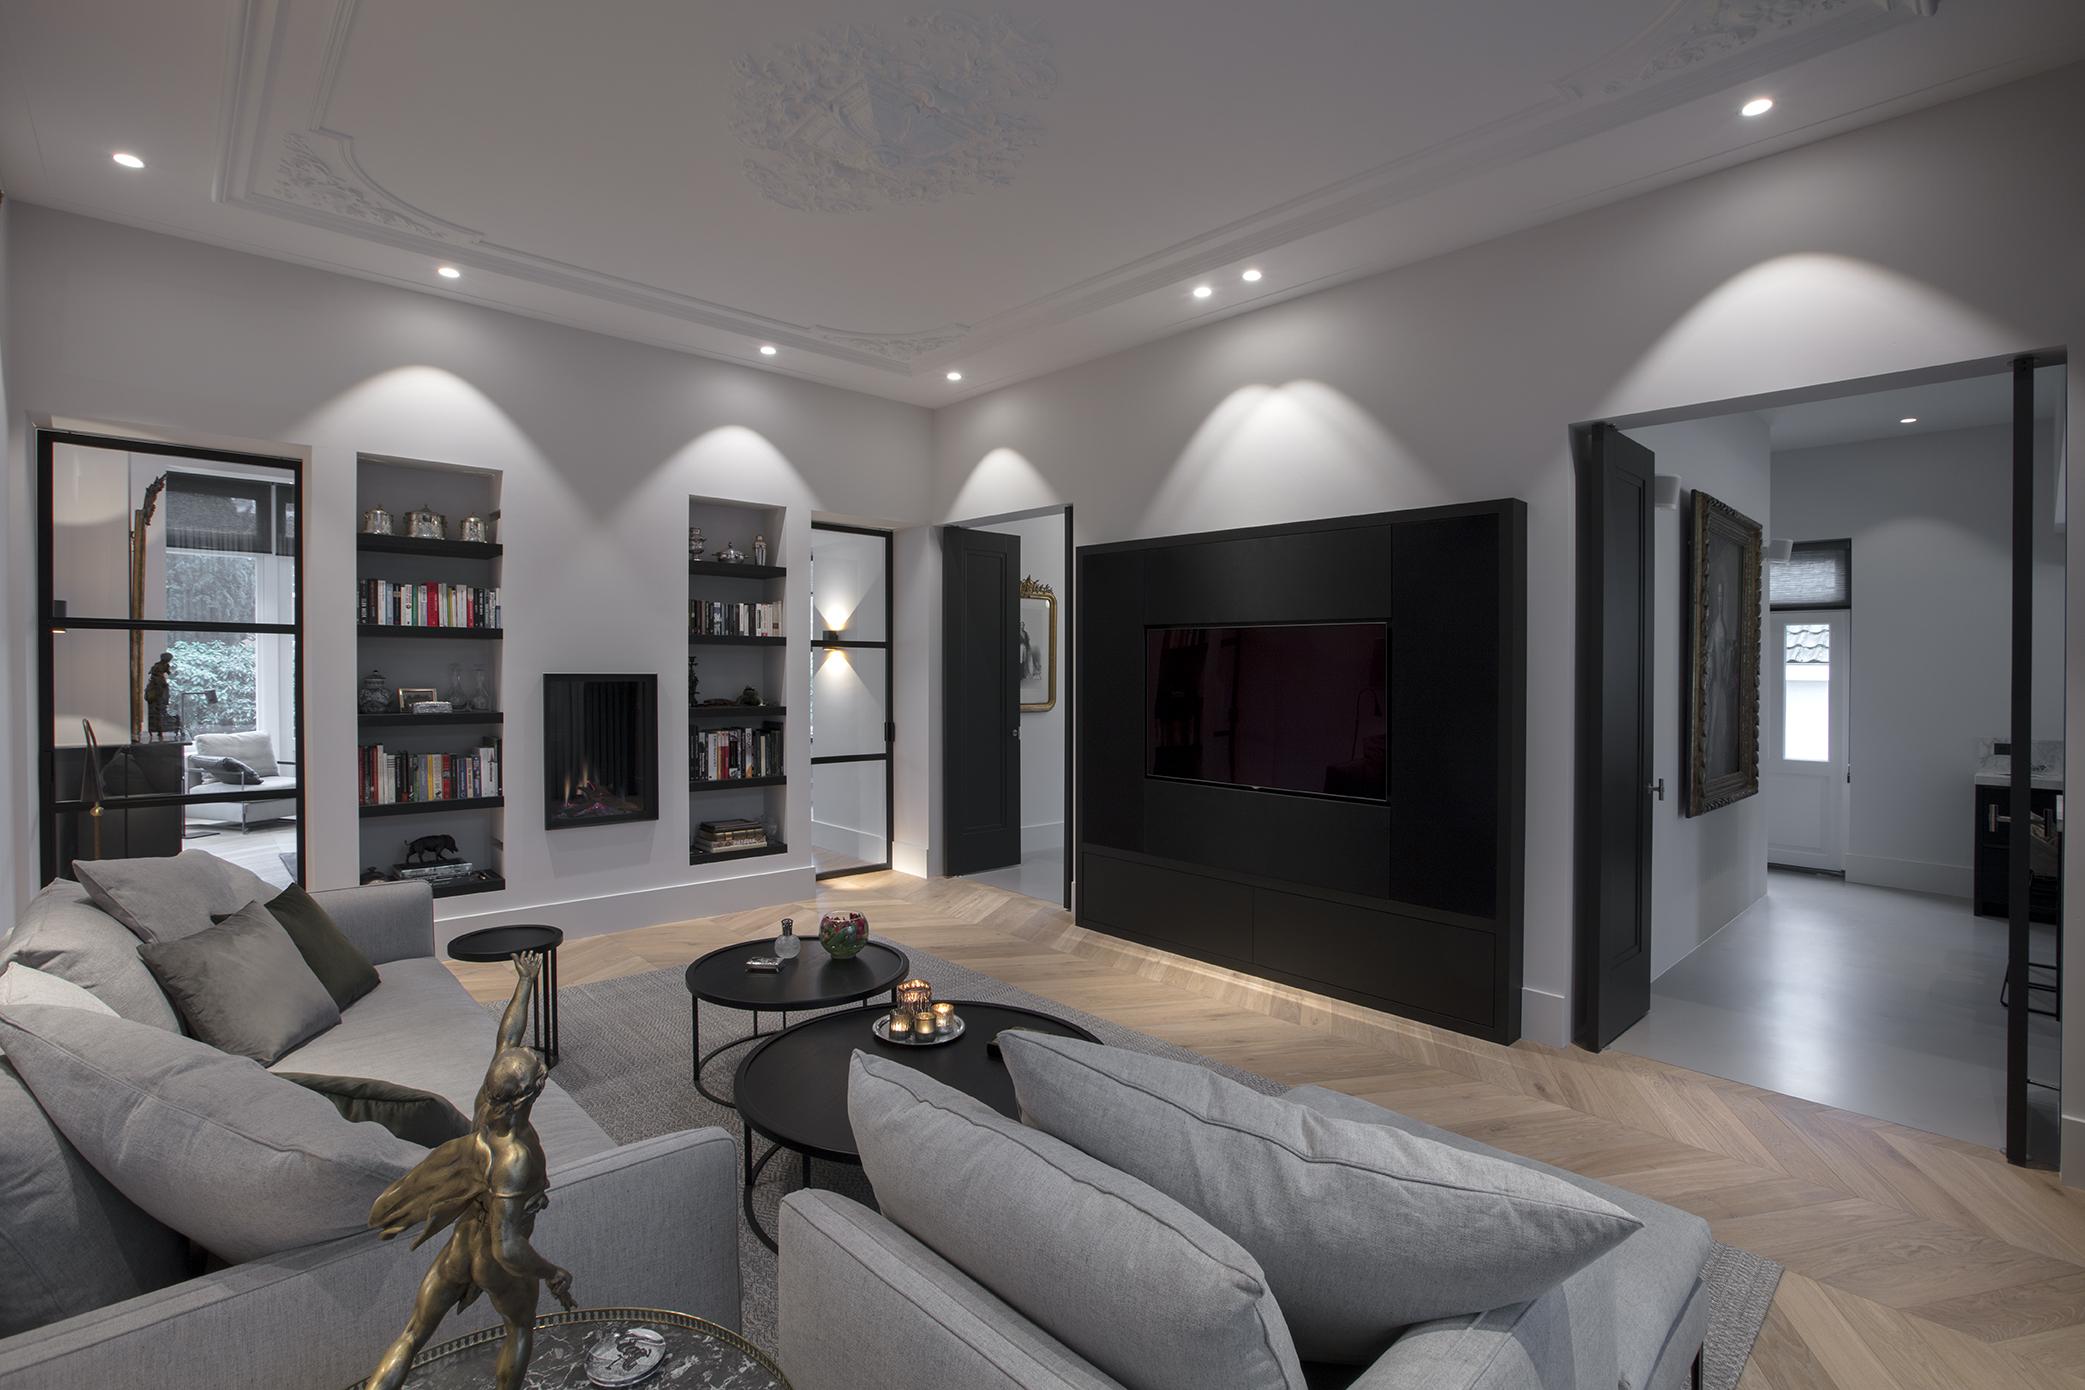 Droomvilla hilversum u interieurfotograaf fotograaf michael van